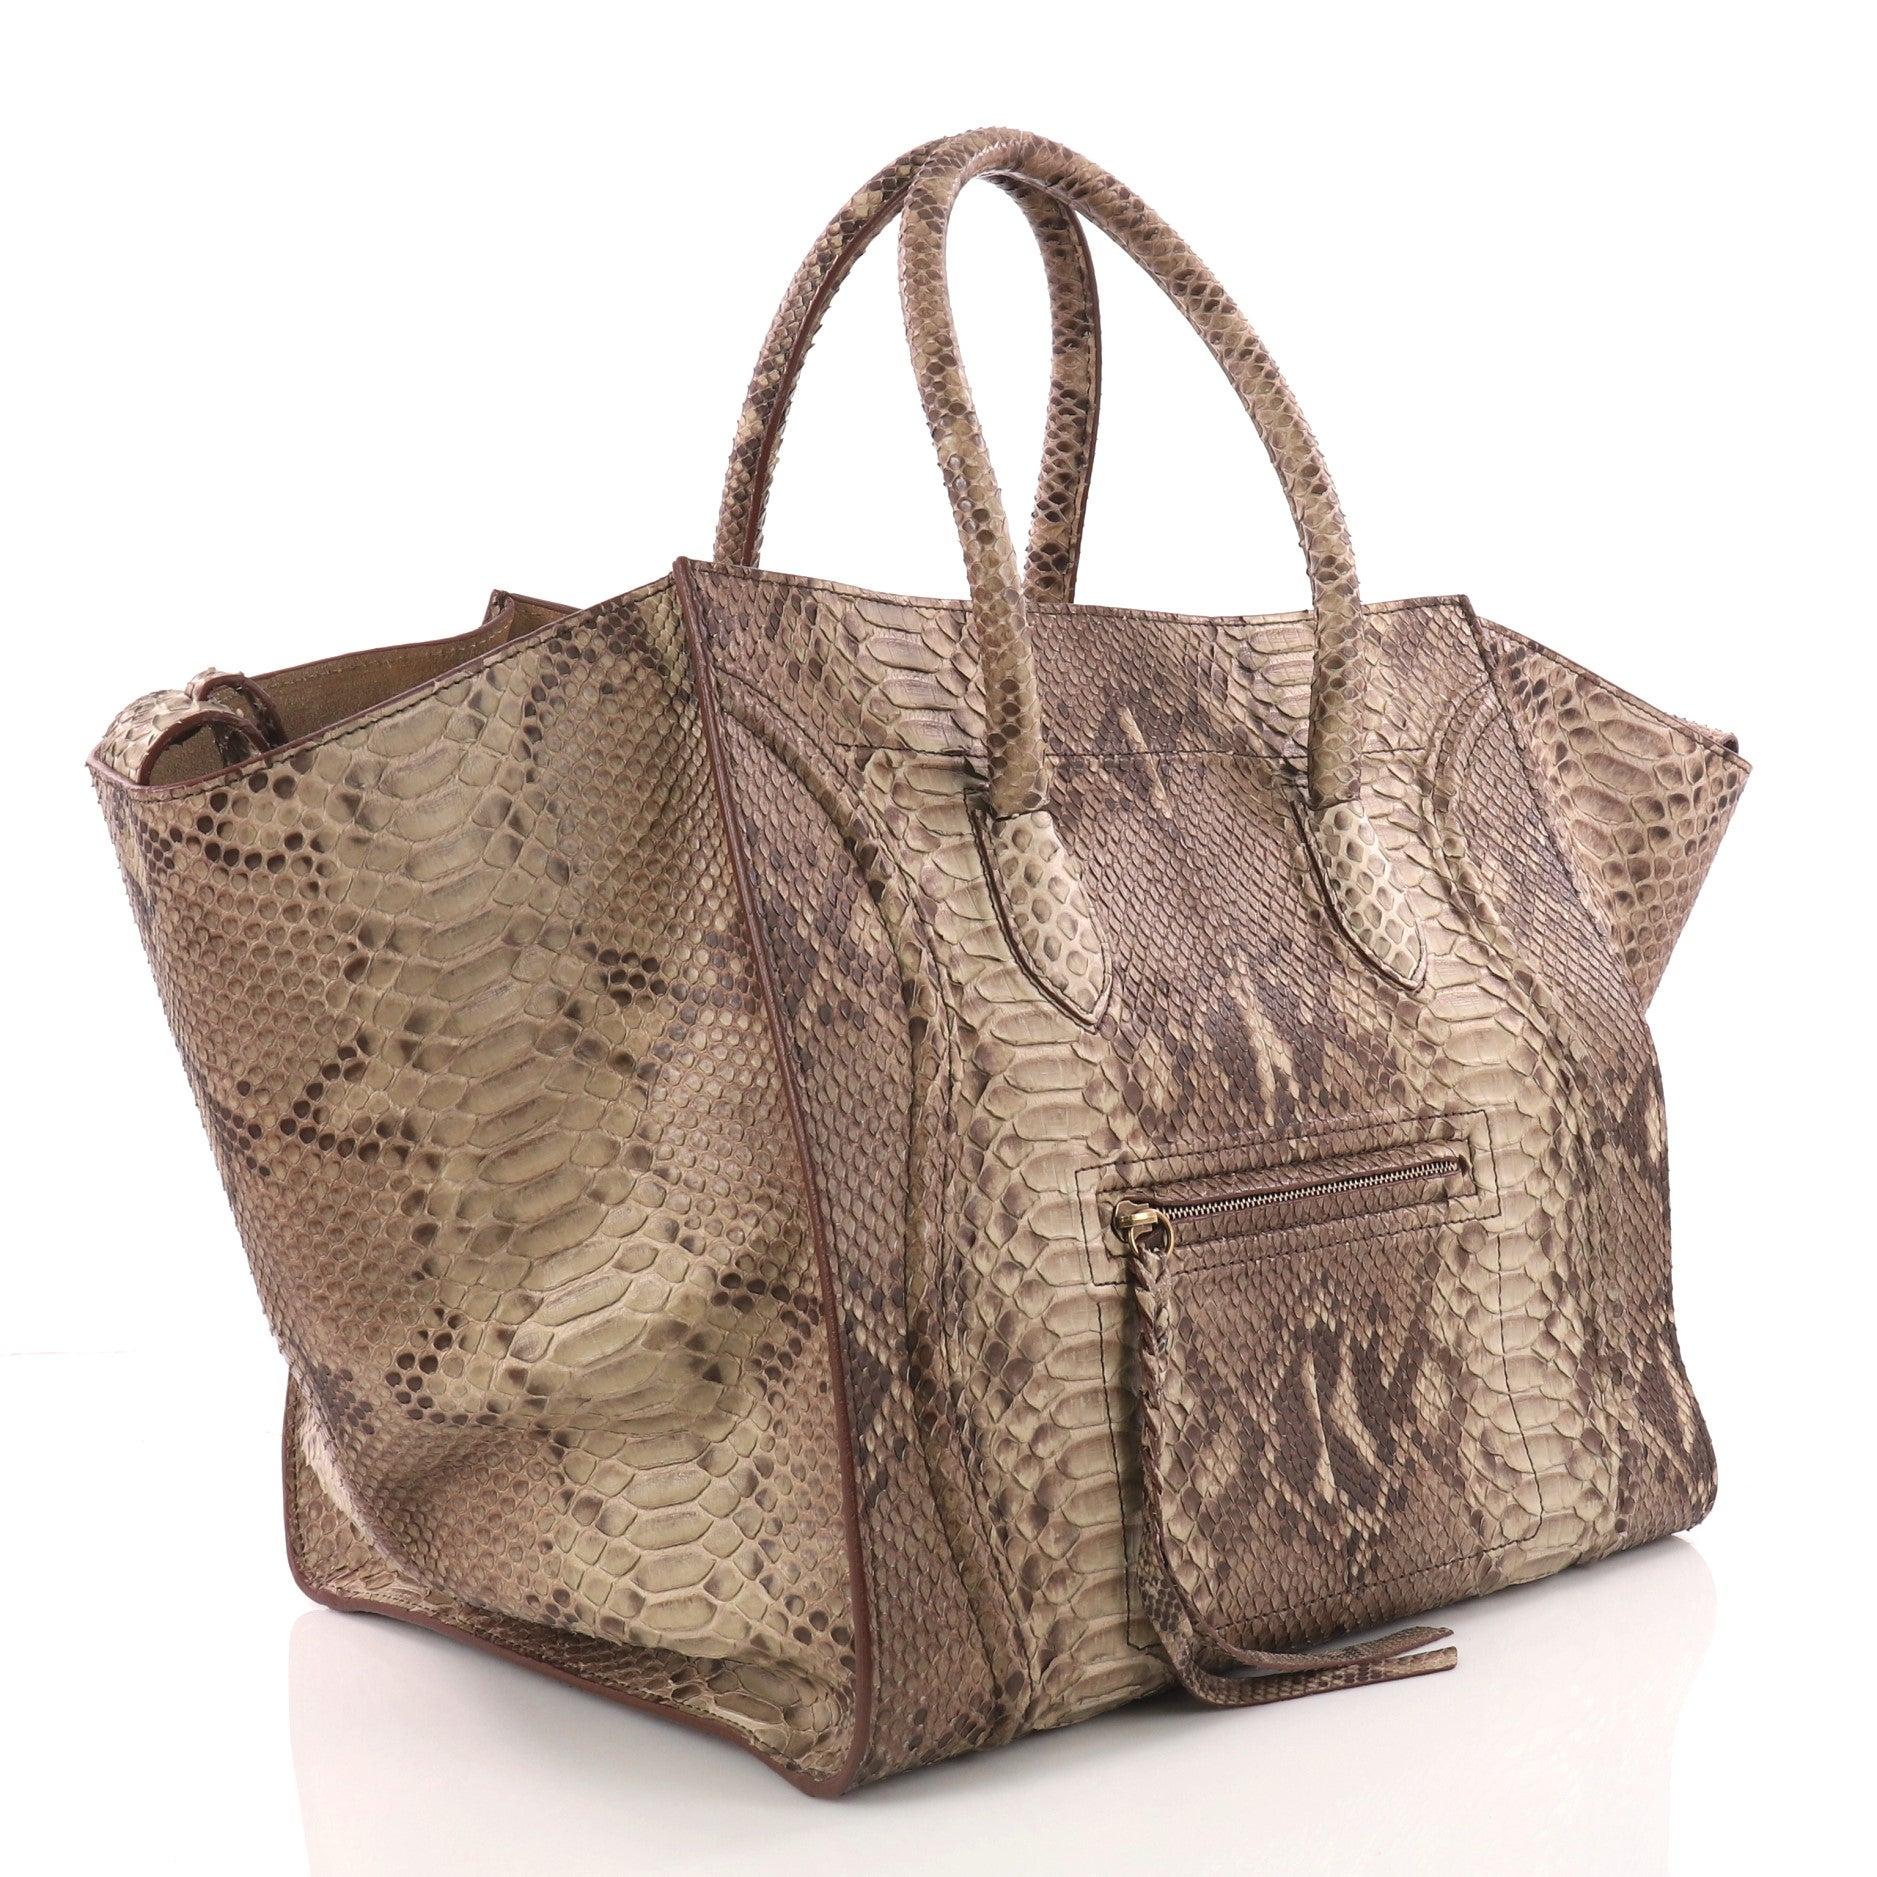 31462cbbf2 Celine Phantom Handbag Python Large at 1stdibs